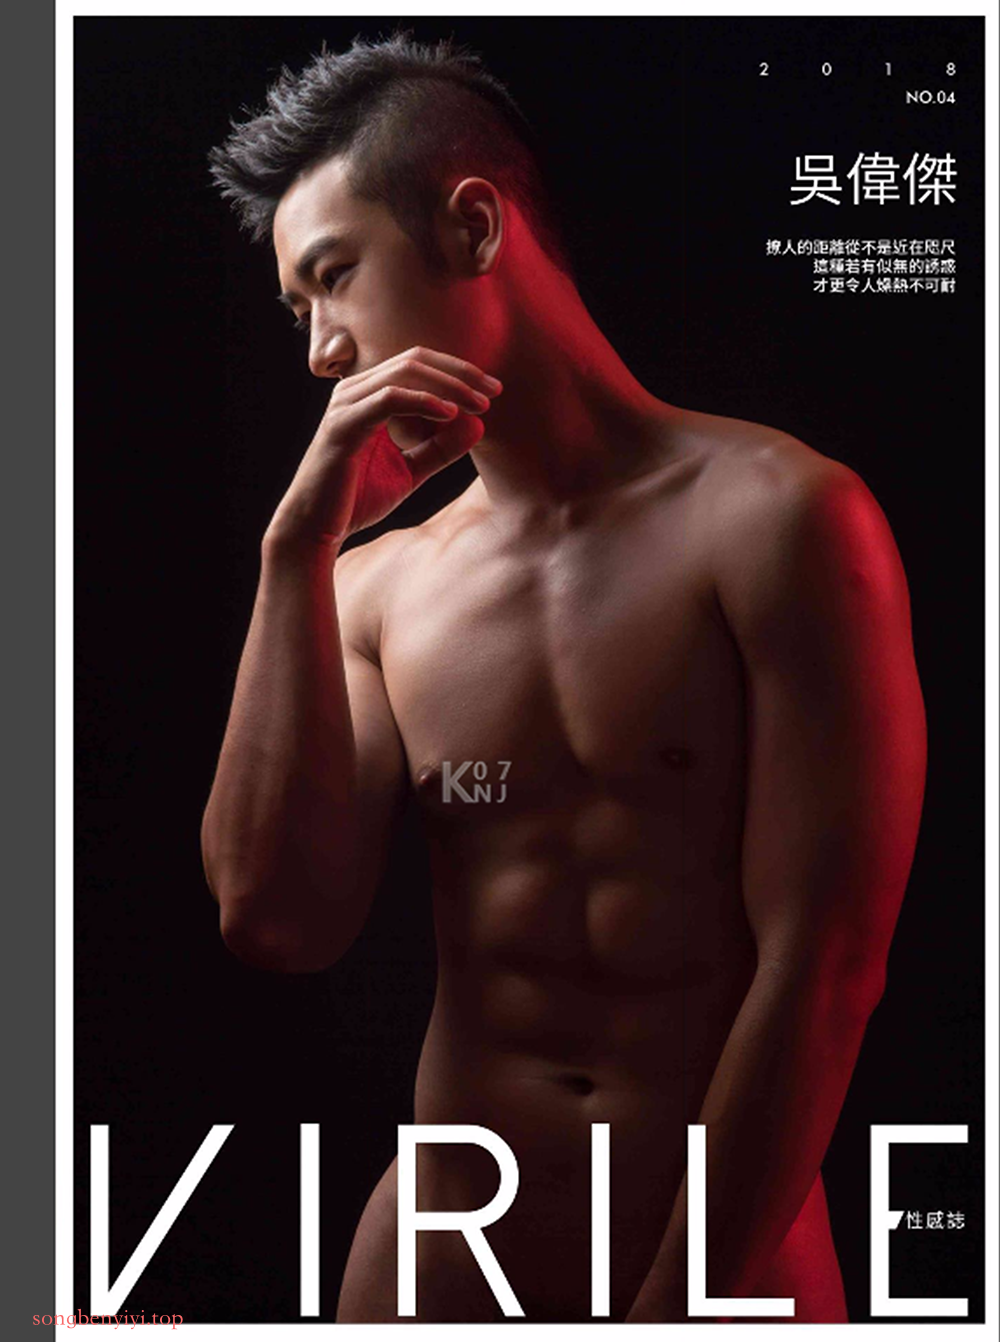 Virile NO.04(SEXY)性感誌健身型男-吳偉傑【ebook】-01.png